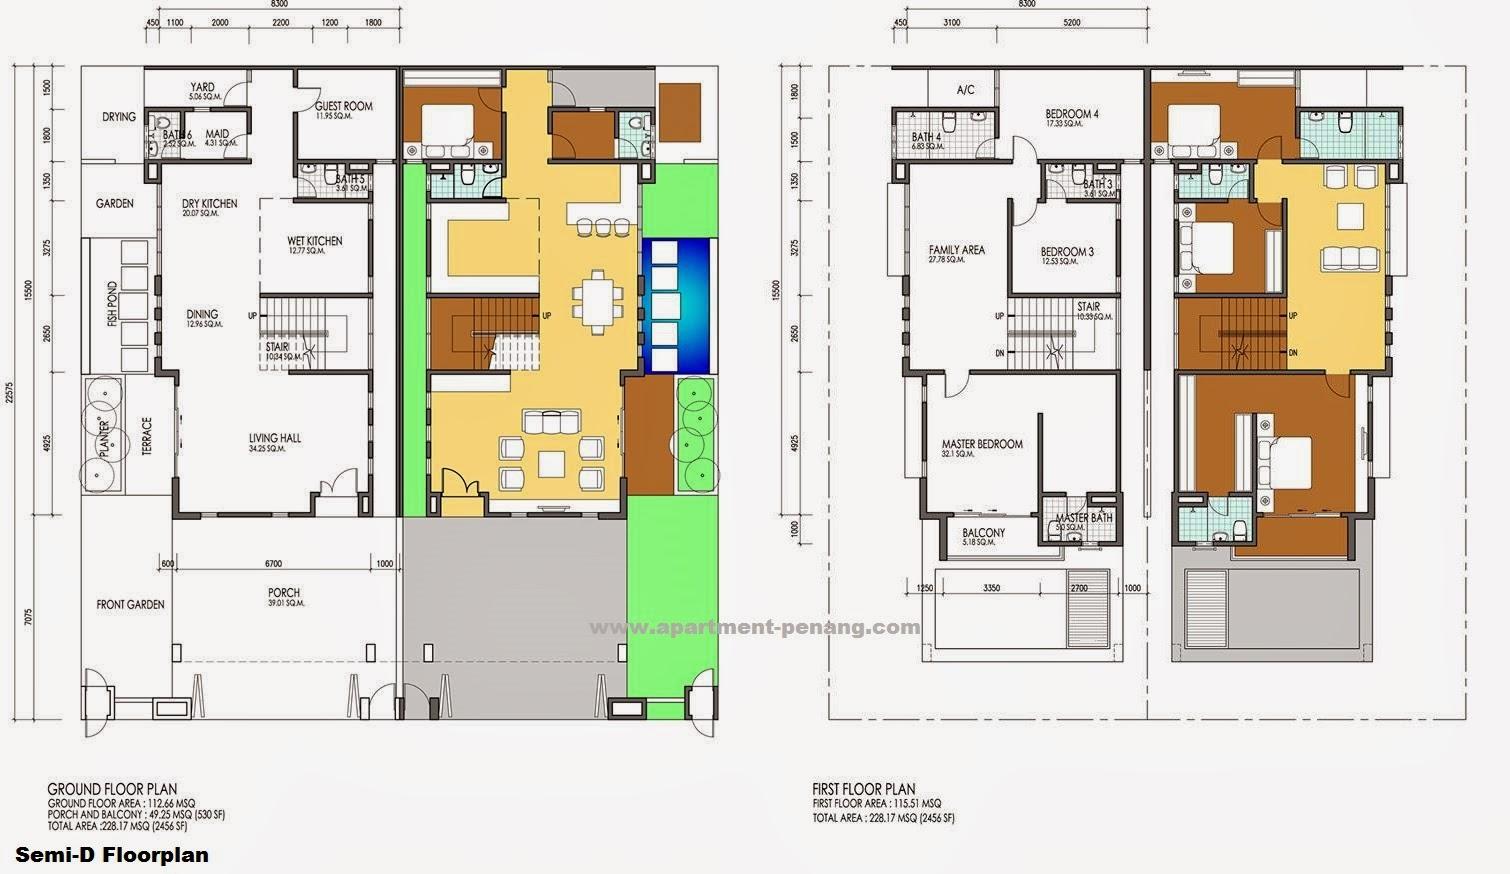 Taman villa indah apartment for Double storey semi detached house floor plan